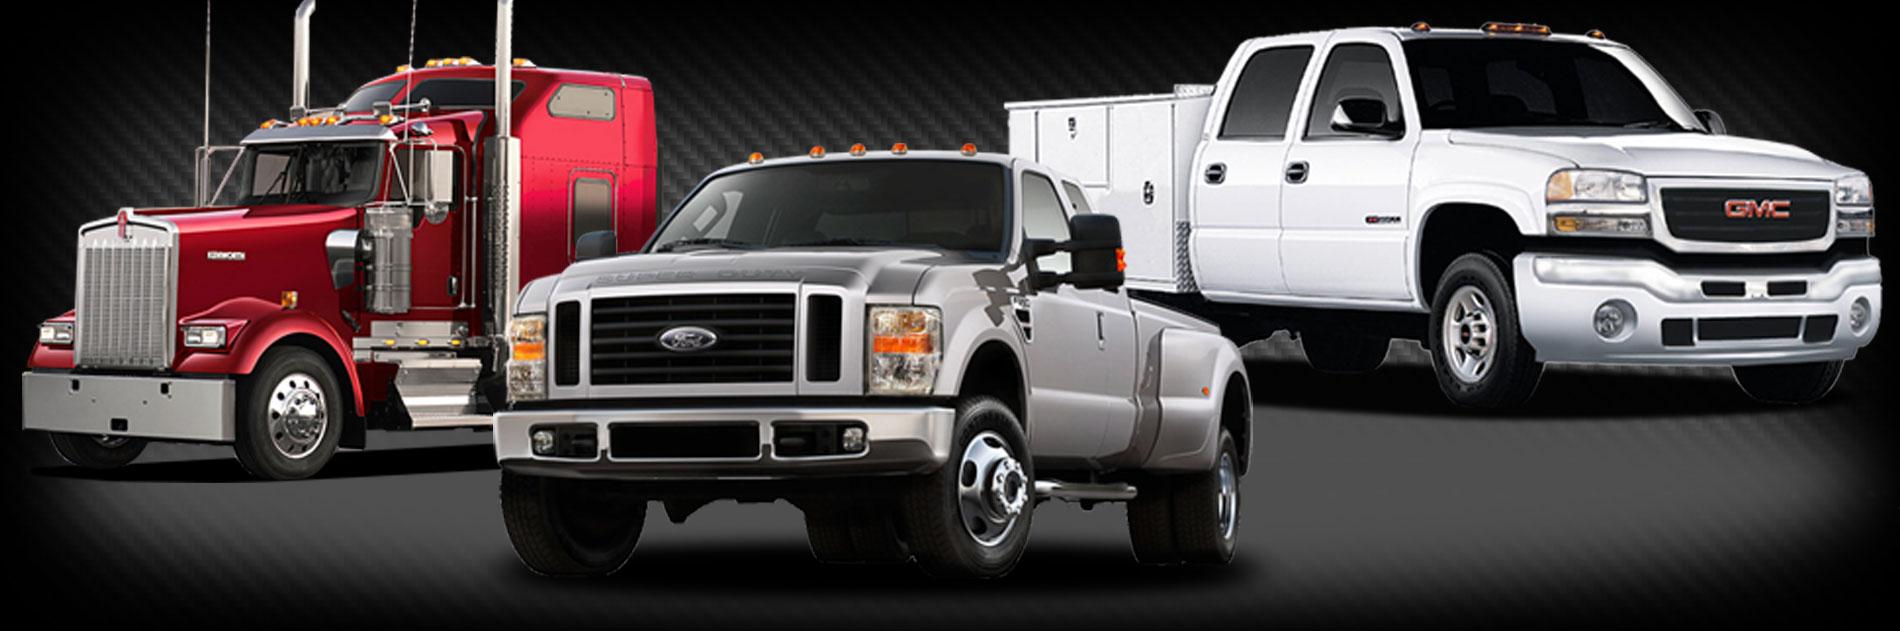 ramsey truck sales llc car dealer in benton ar. Black Bedroom Furniture Sets. Home Design Ideas